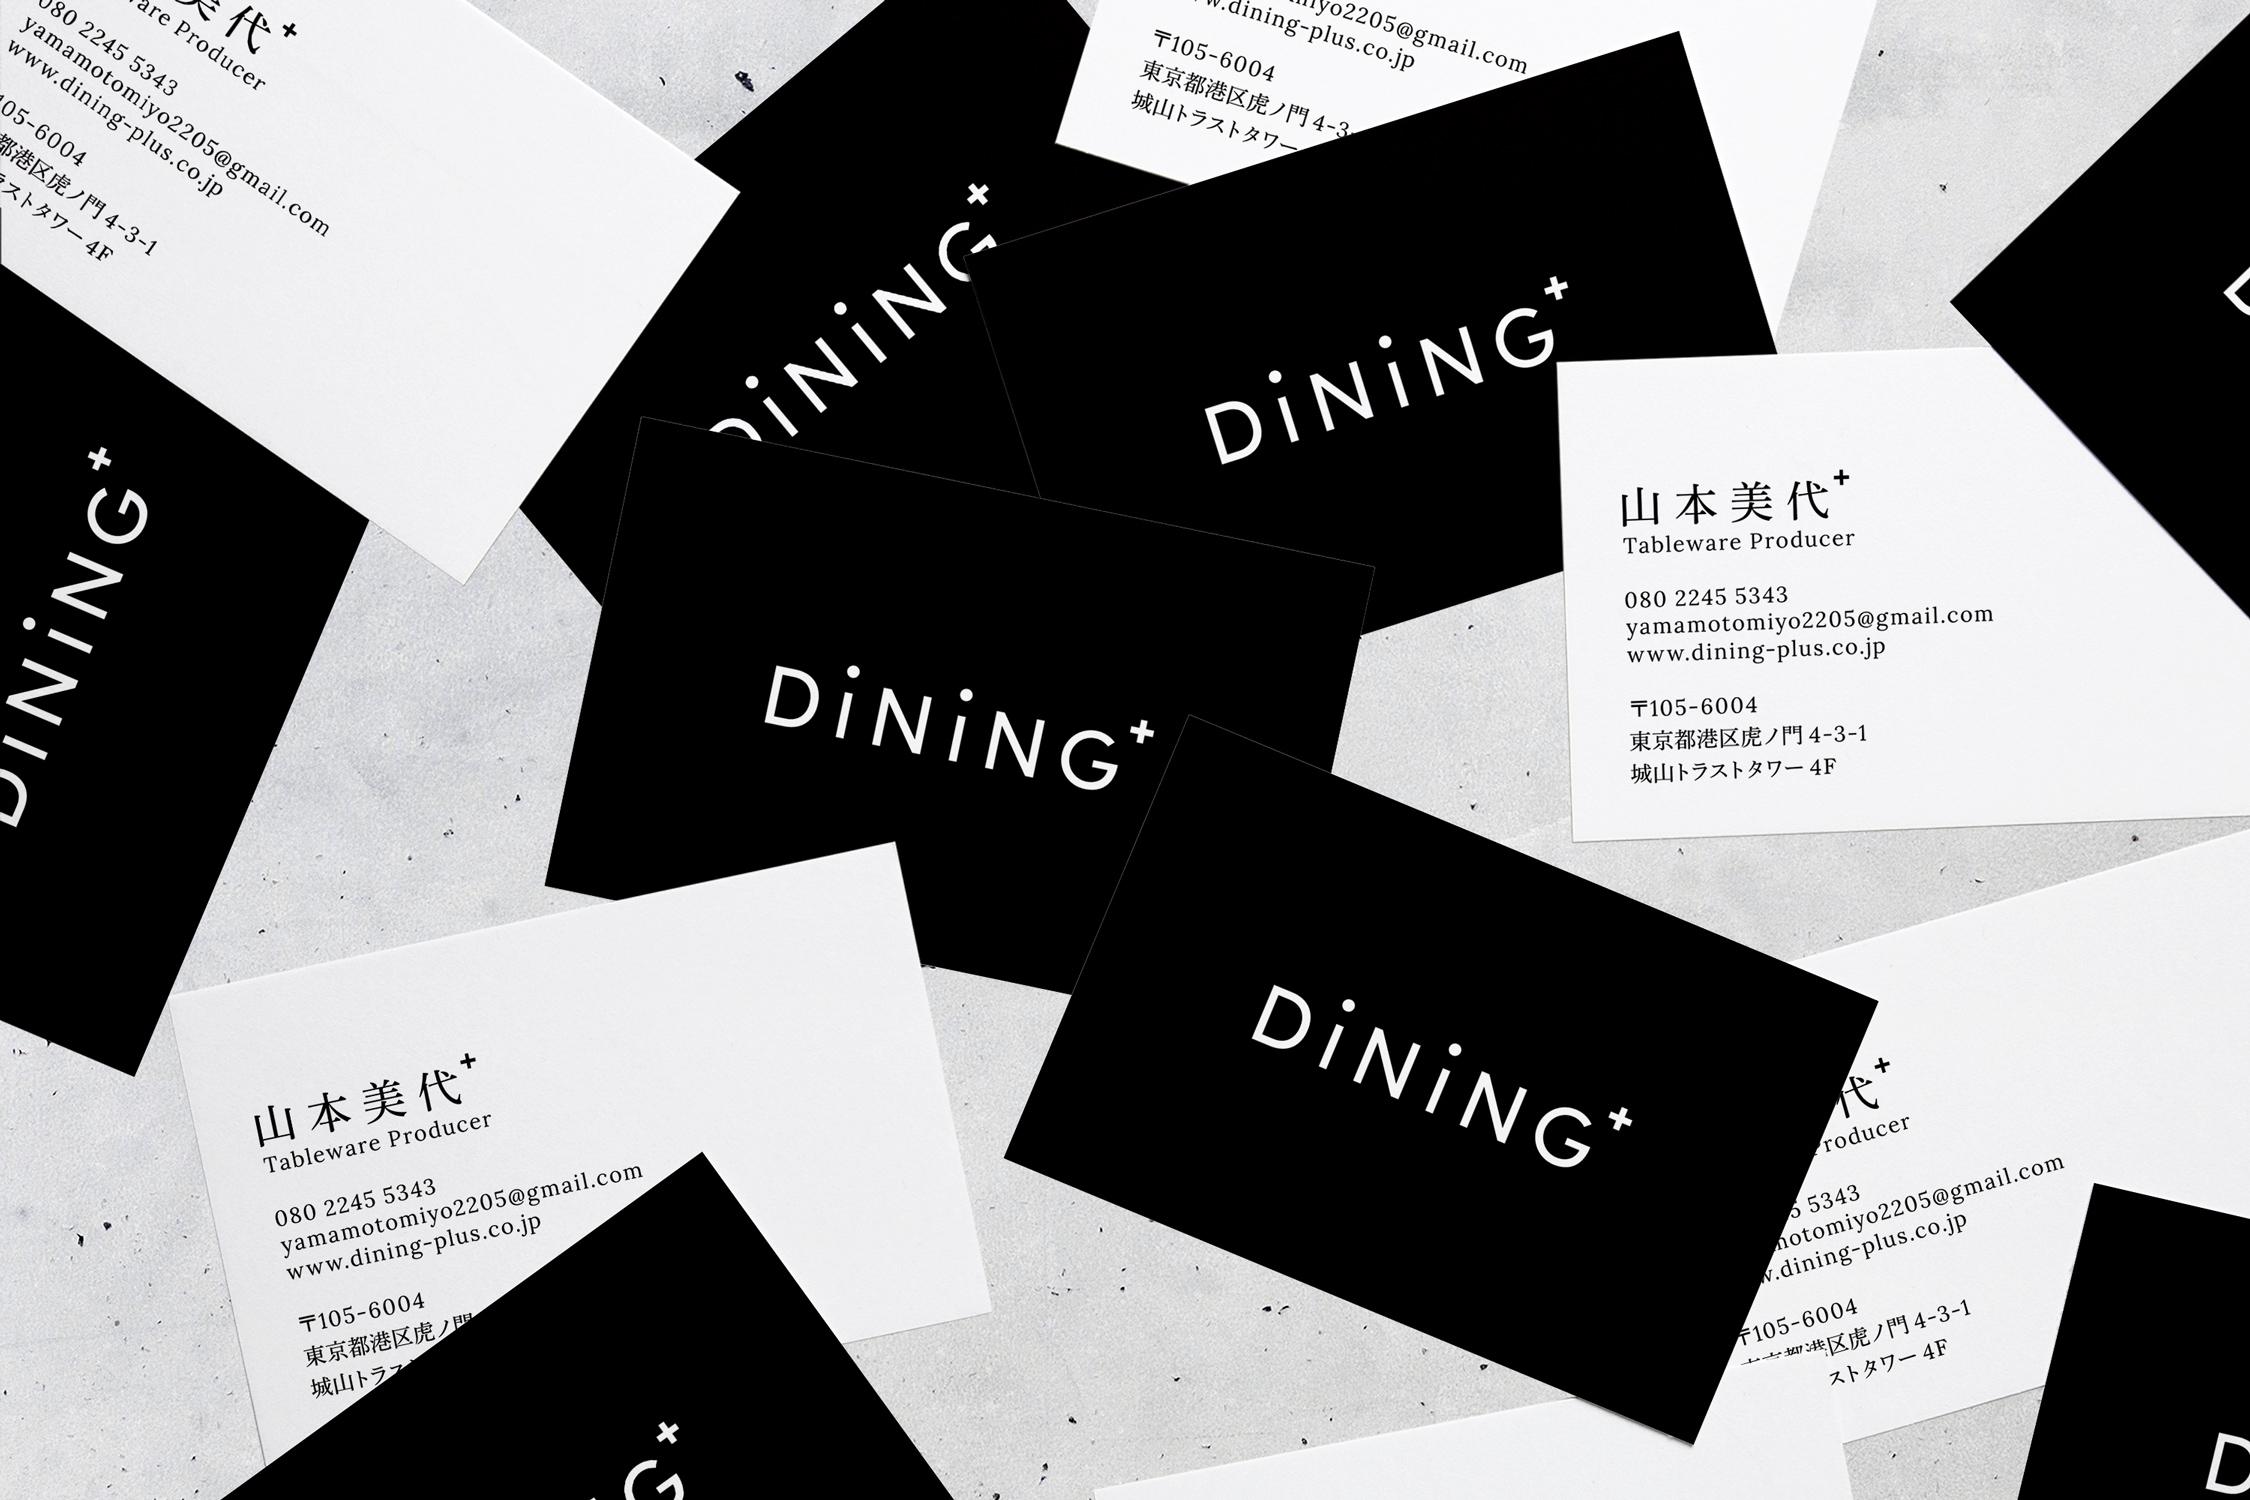 Dining+